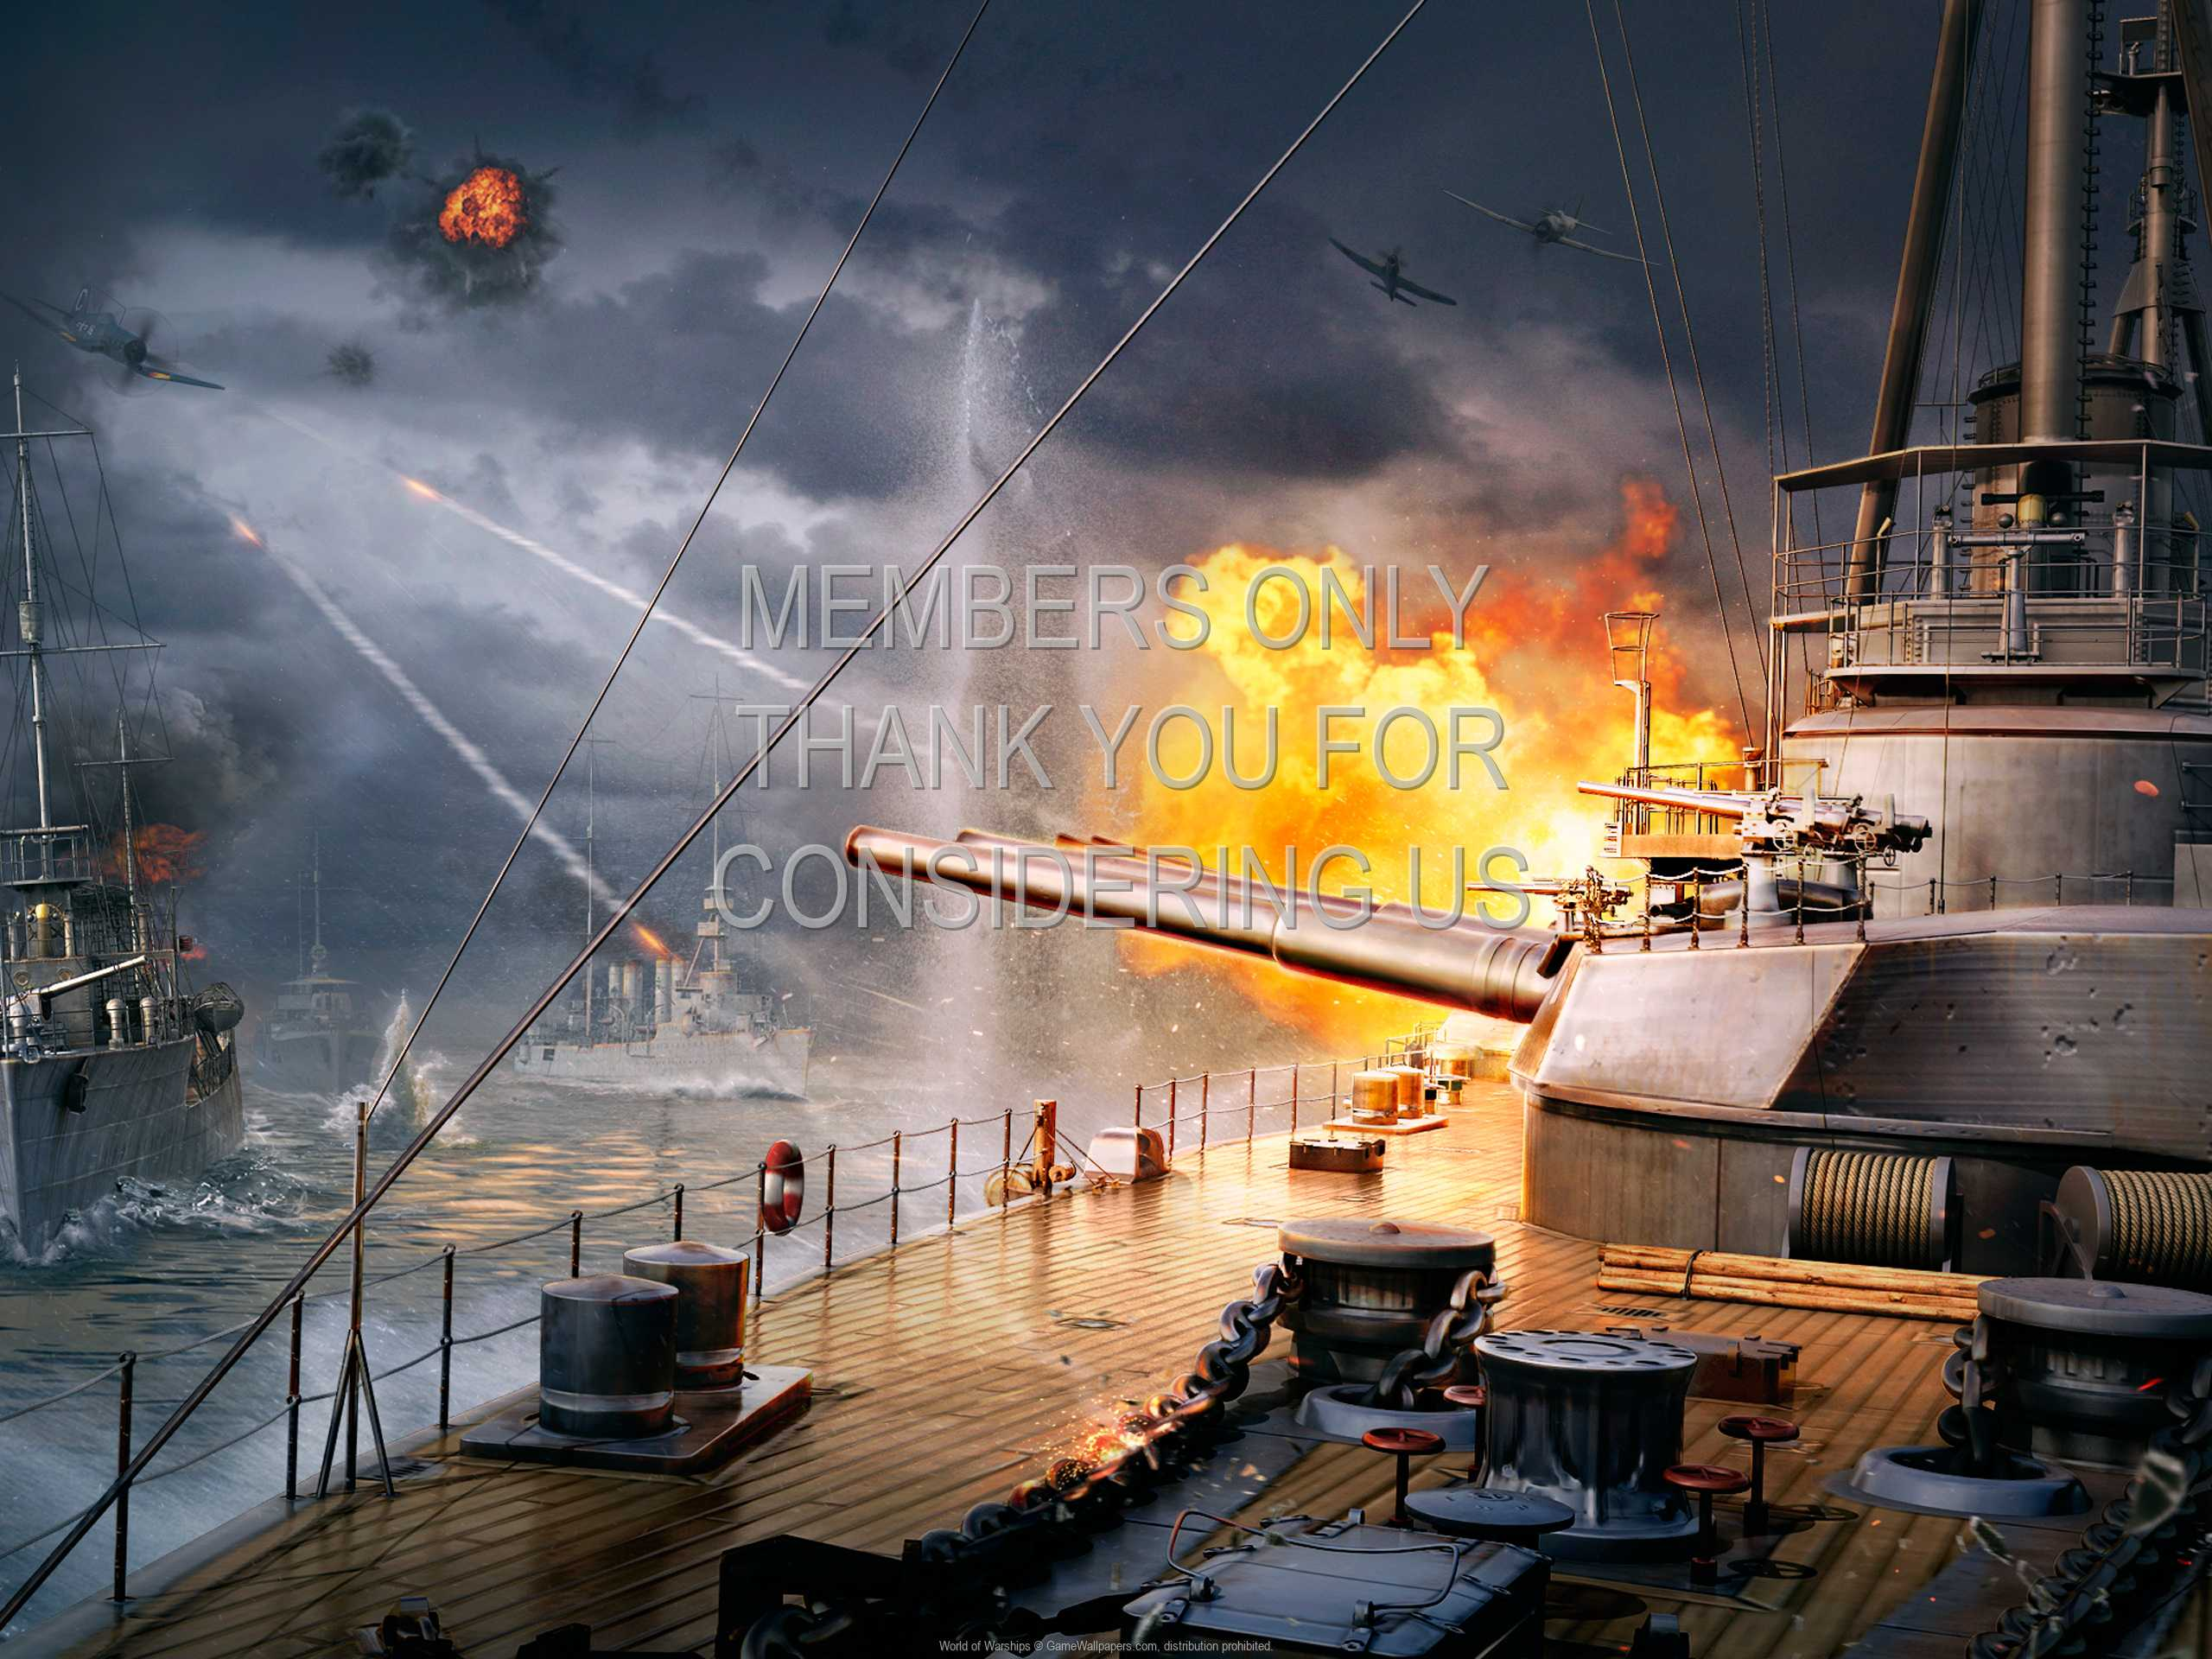 World of Warships 1080p Horizontal Mobile wallpaper or background 03